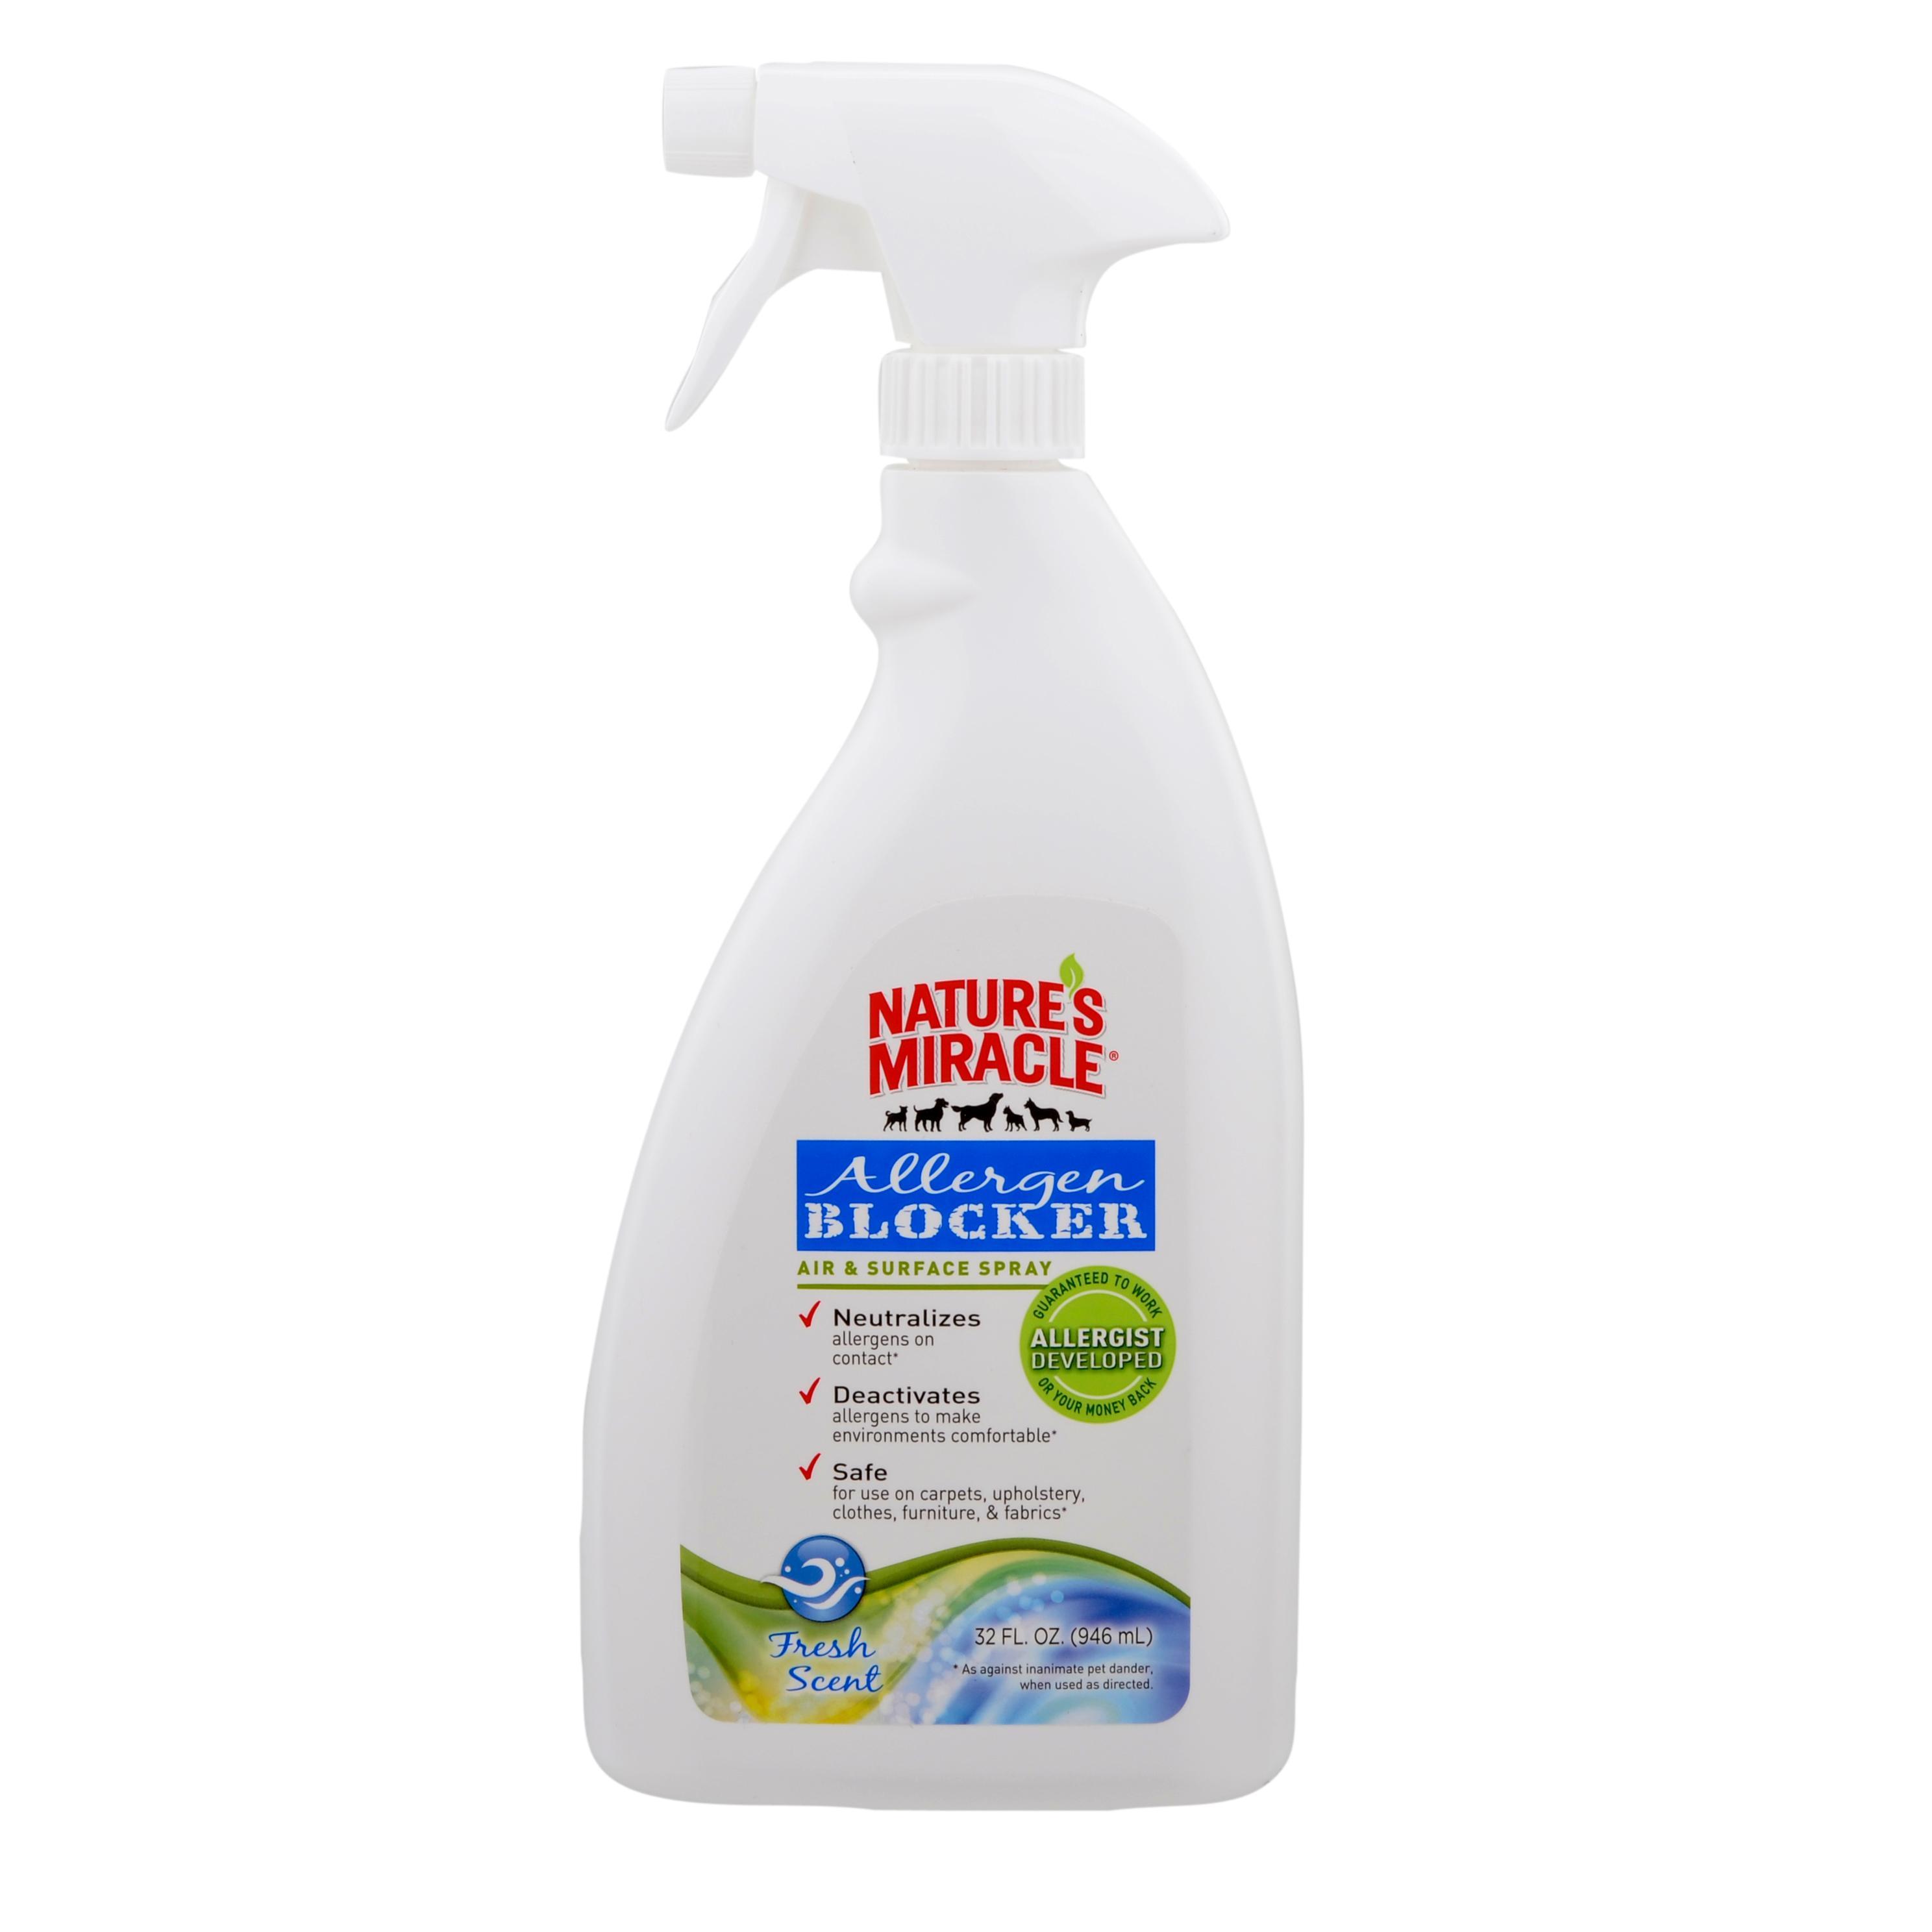 Nature S Miracle Allergen Blocker Review